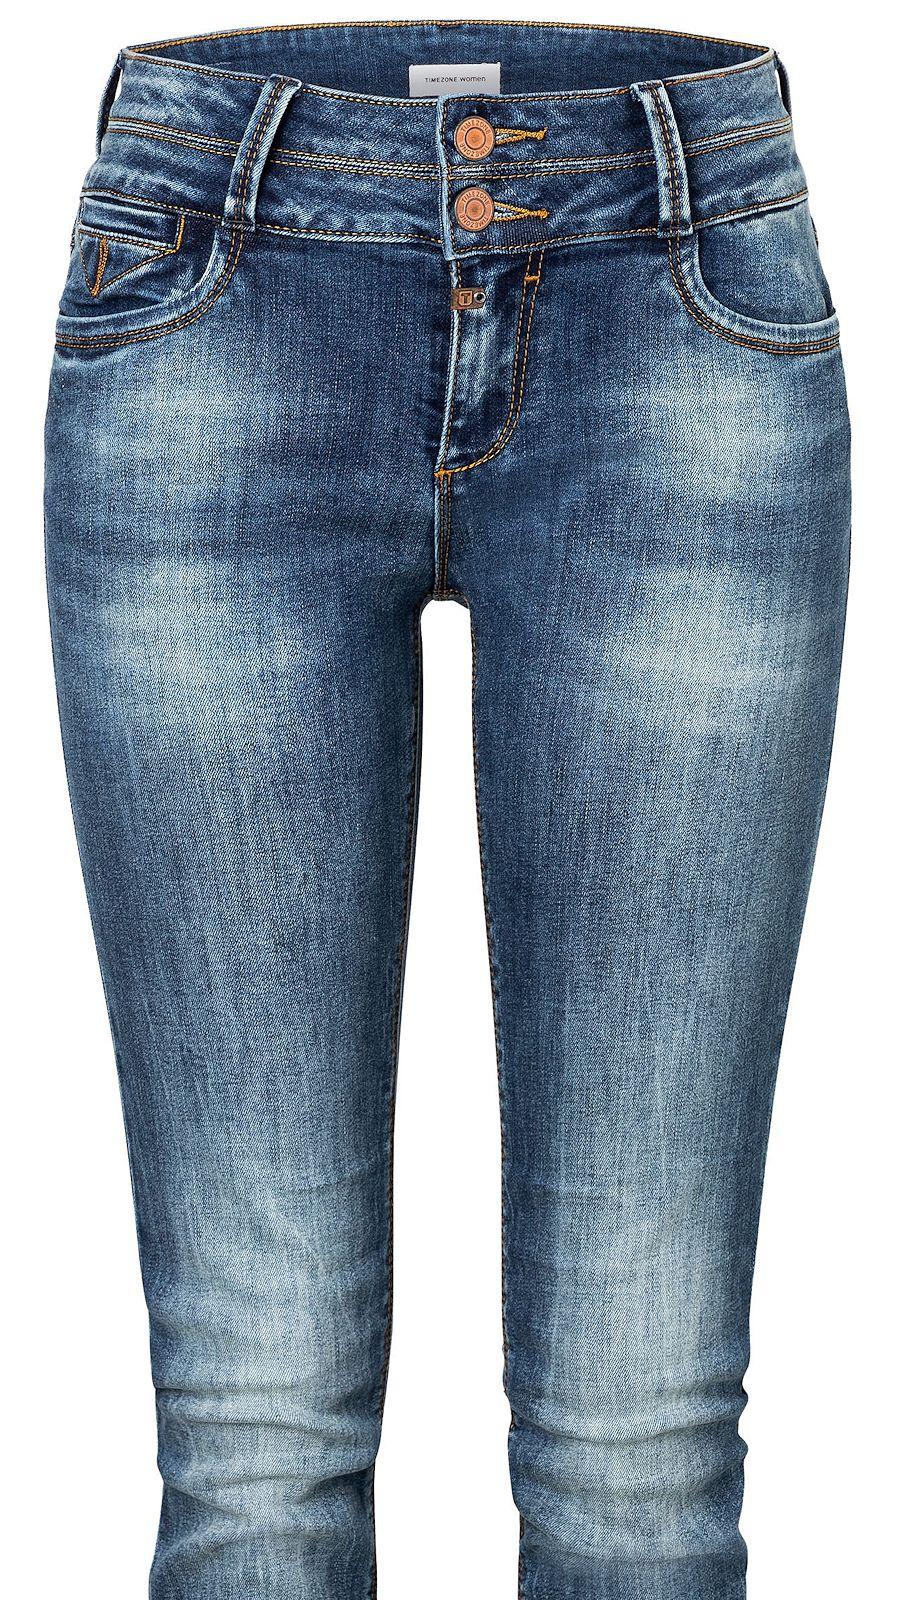 Timezone Damen Jeans 17 10025 Enya silky vintage wash Slim